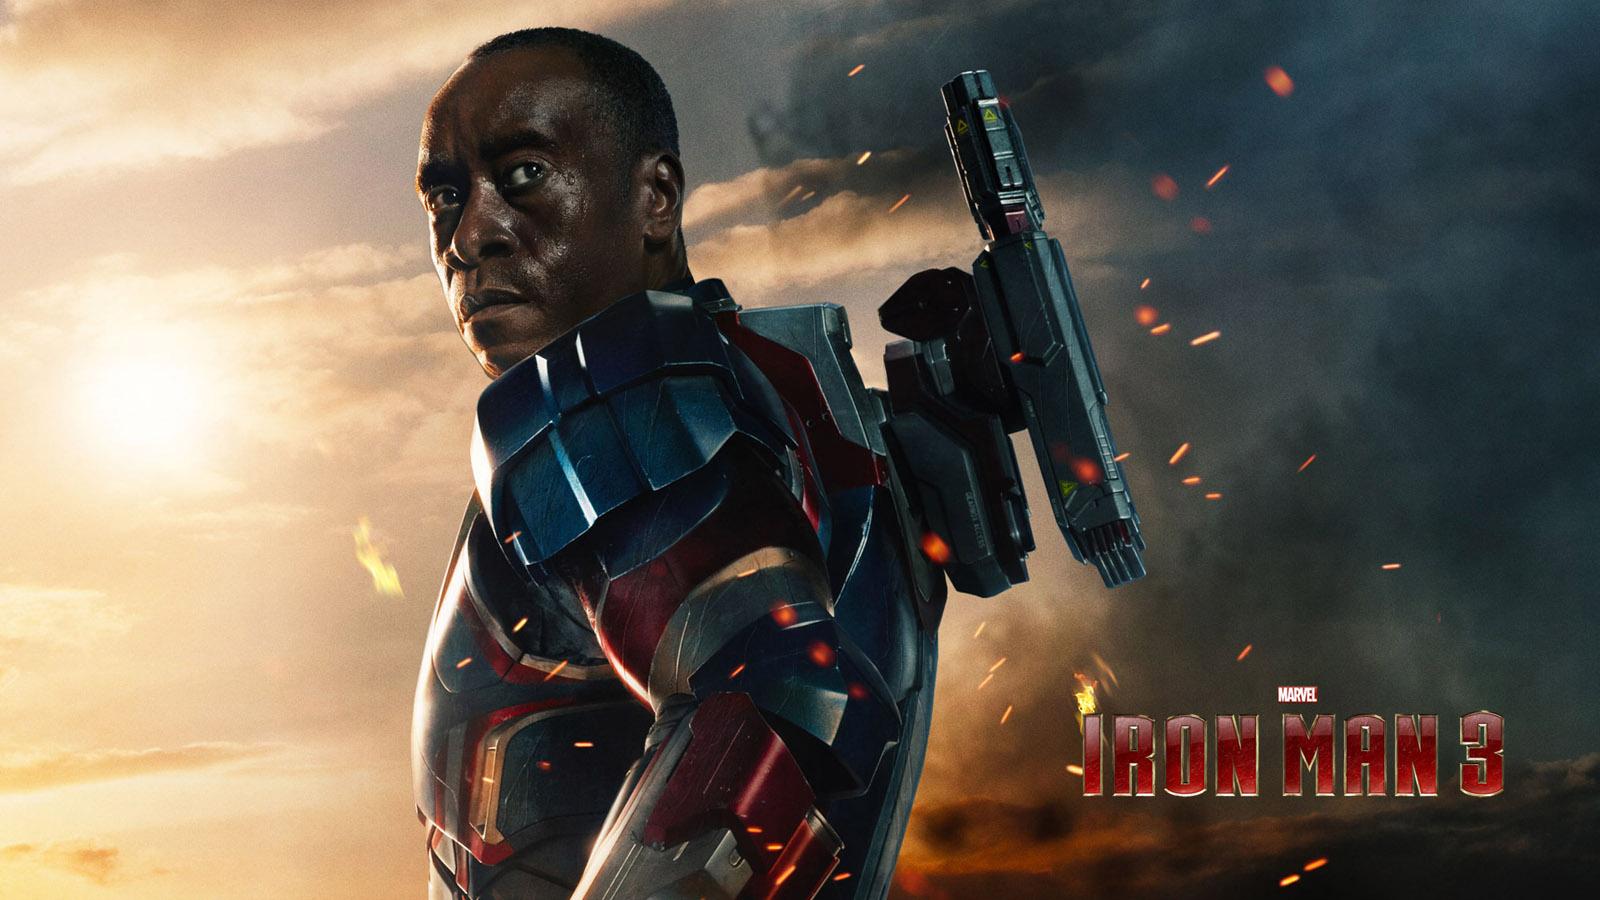 Iron Man 3 Wallpaper Hd 1024x768 Download